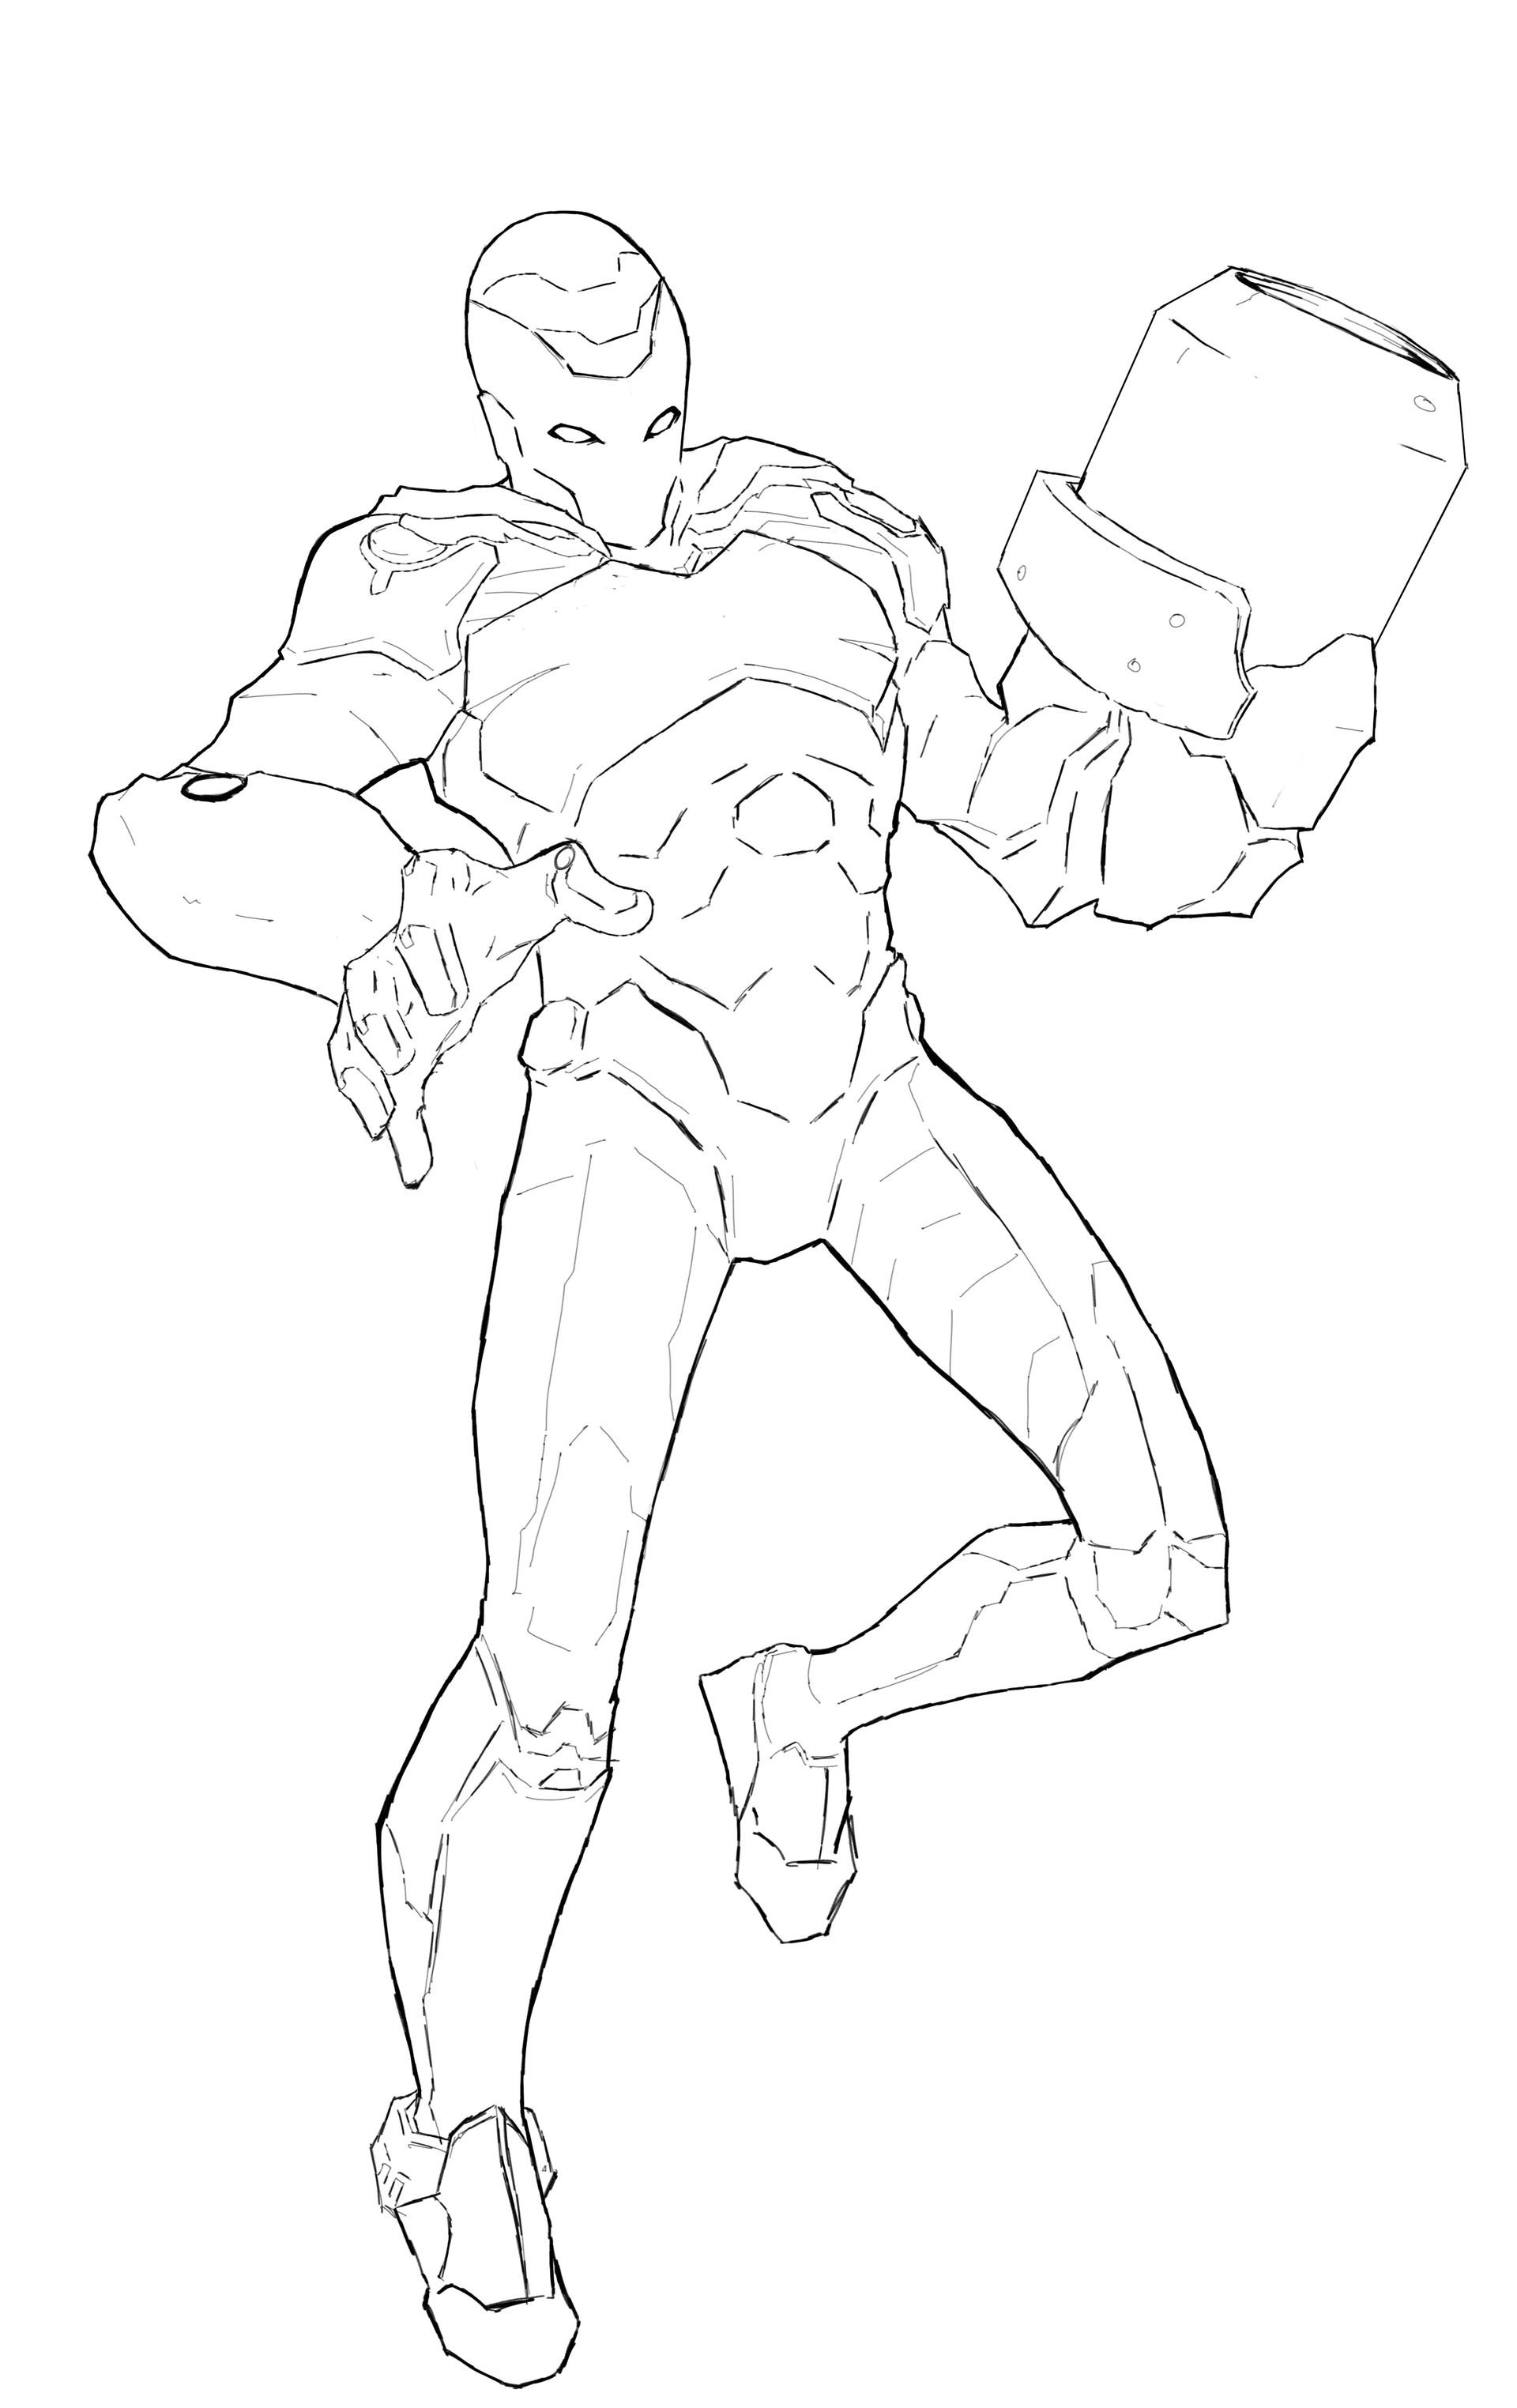 Gbenle maverick cyborg 4